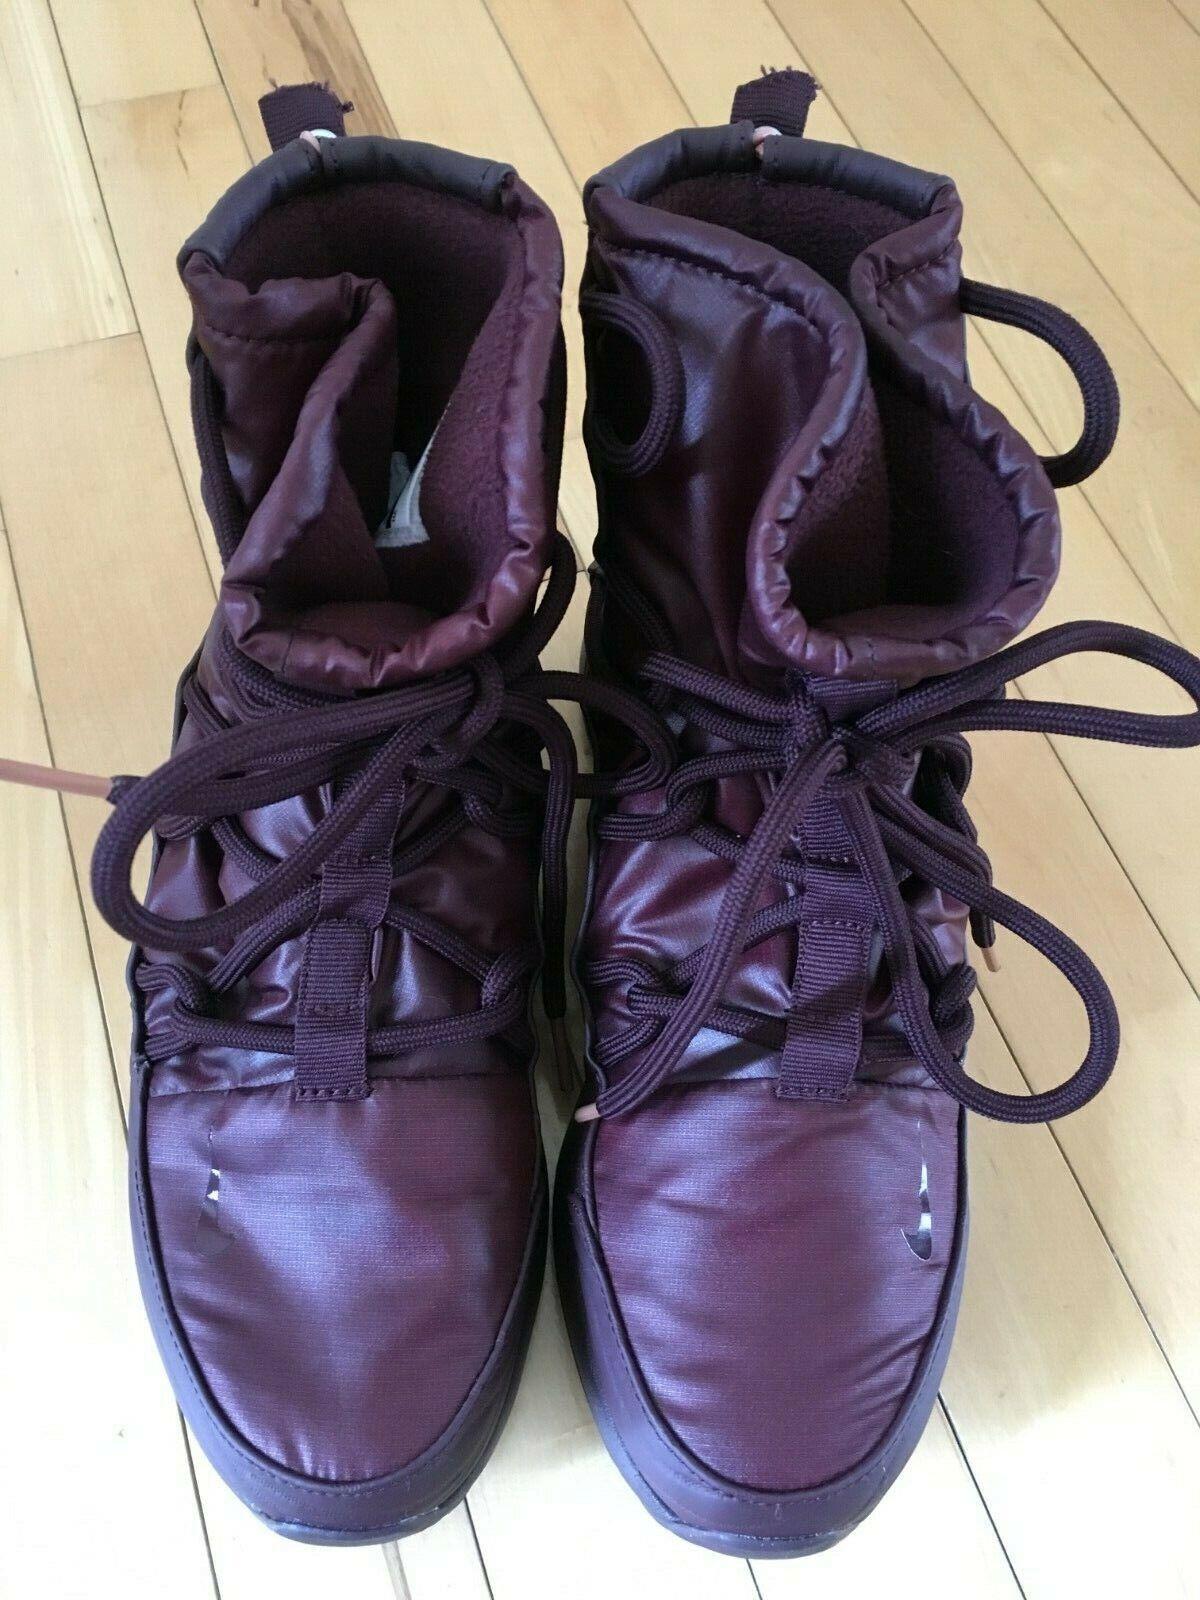 NIKE Women's Tanjun Sneaker Boots - Size 8 Burgundy - WORN ONCE